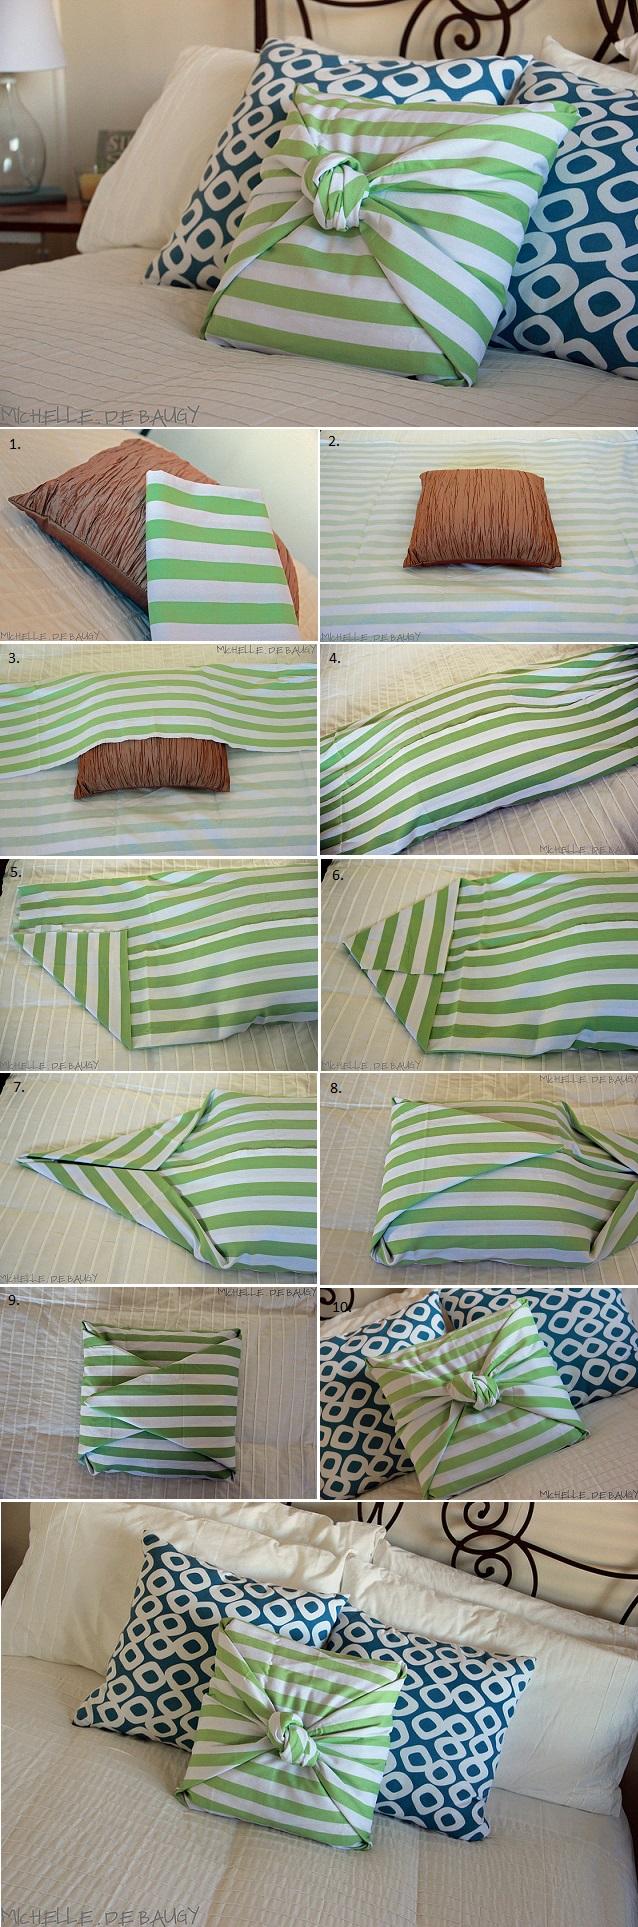 No Sew Pillow Case - DIY